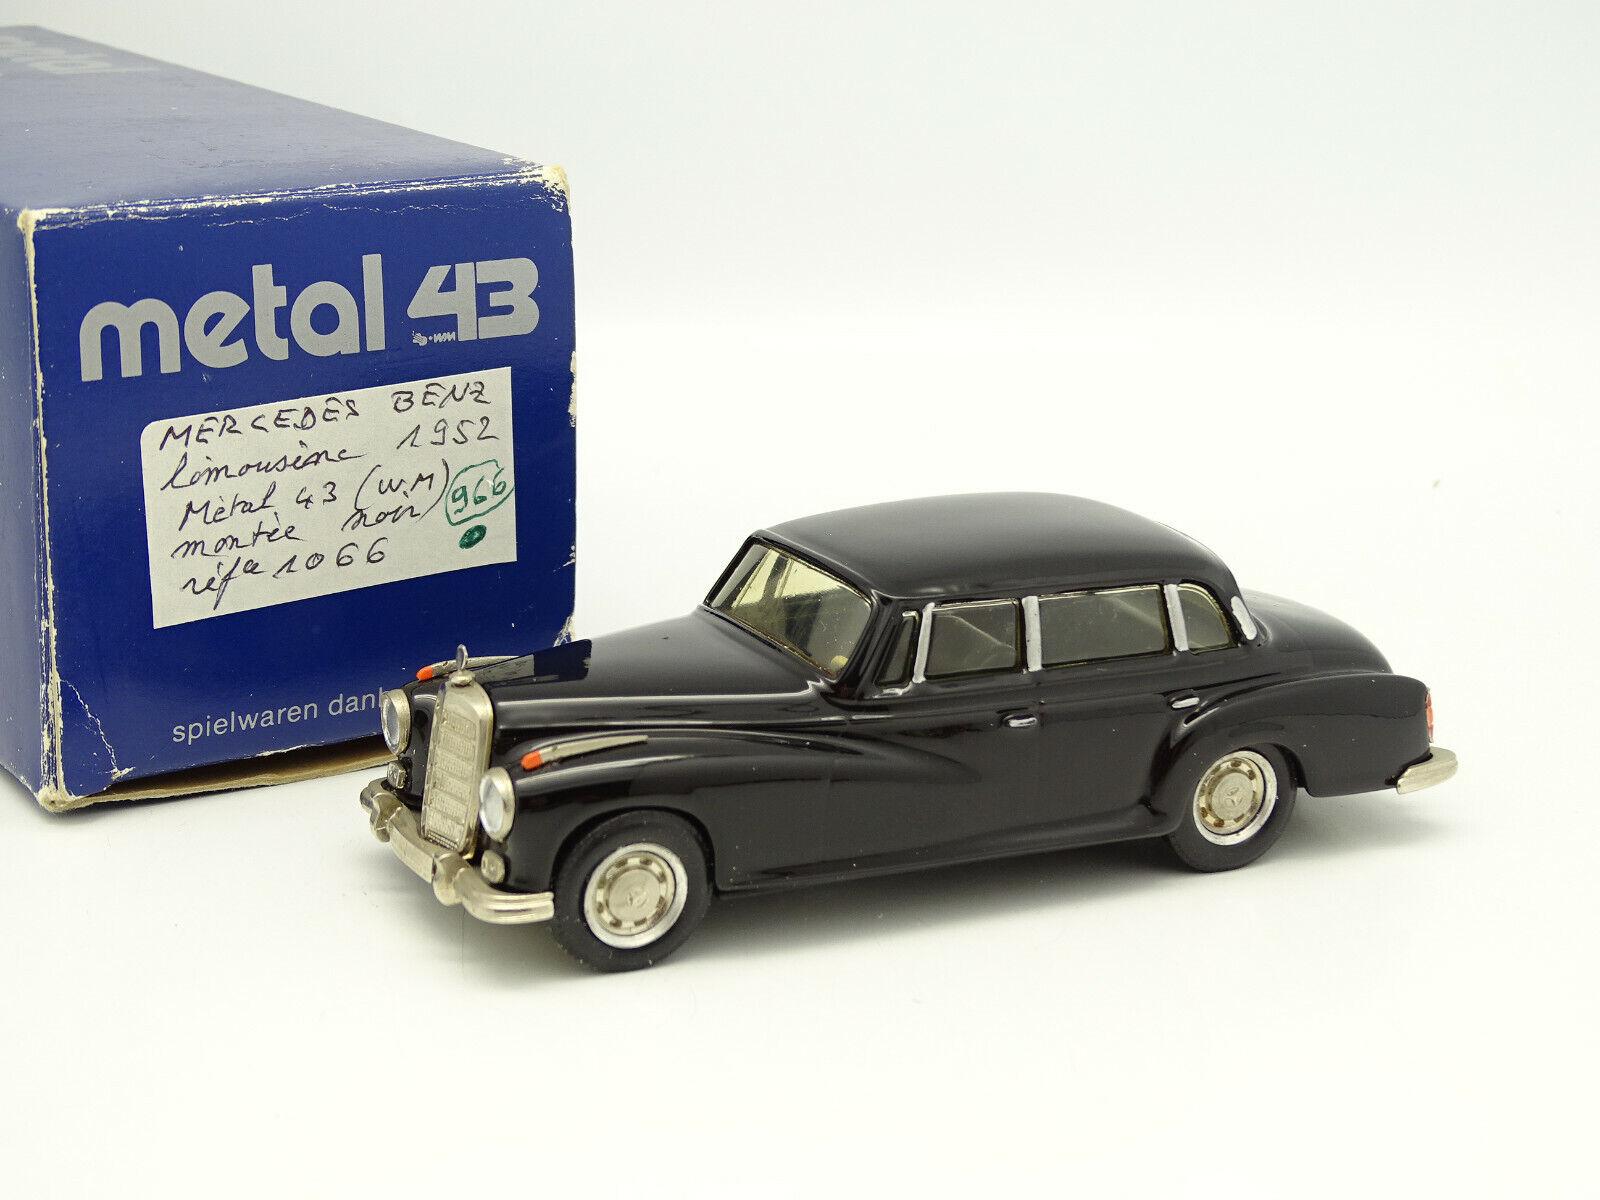 Wm metal 43 spielwaren Danhausen 1 43 - mercedes 300 limousine 1952 black